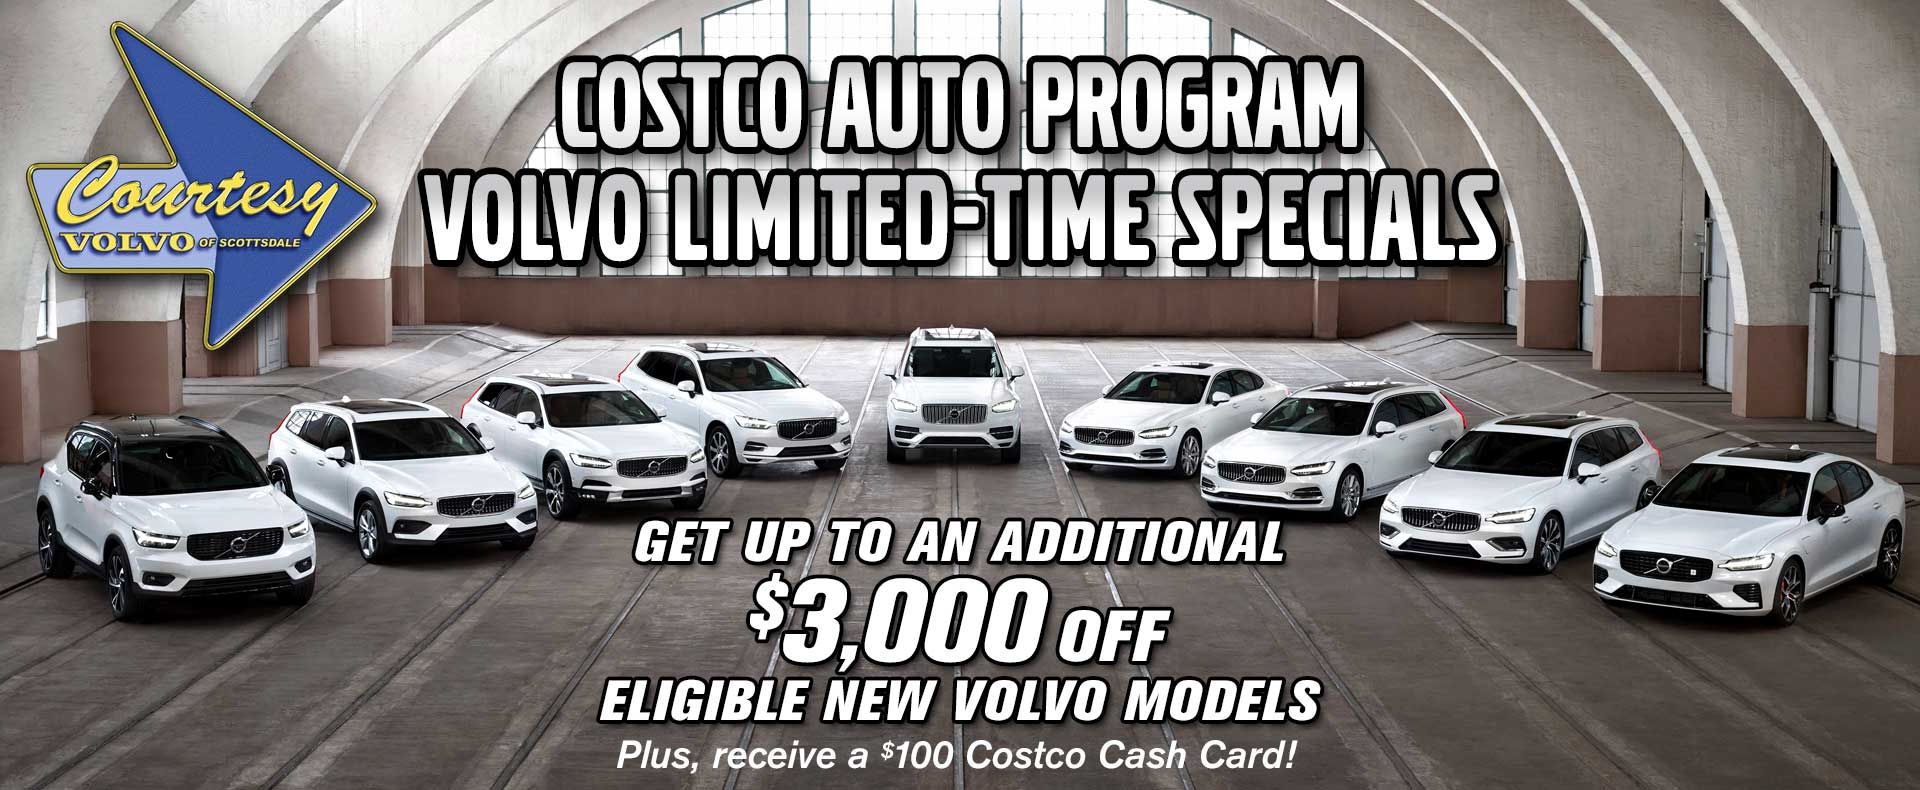 Costco Auto Program >> The Costco Volvo Promotion Launches For Limited Time